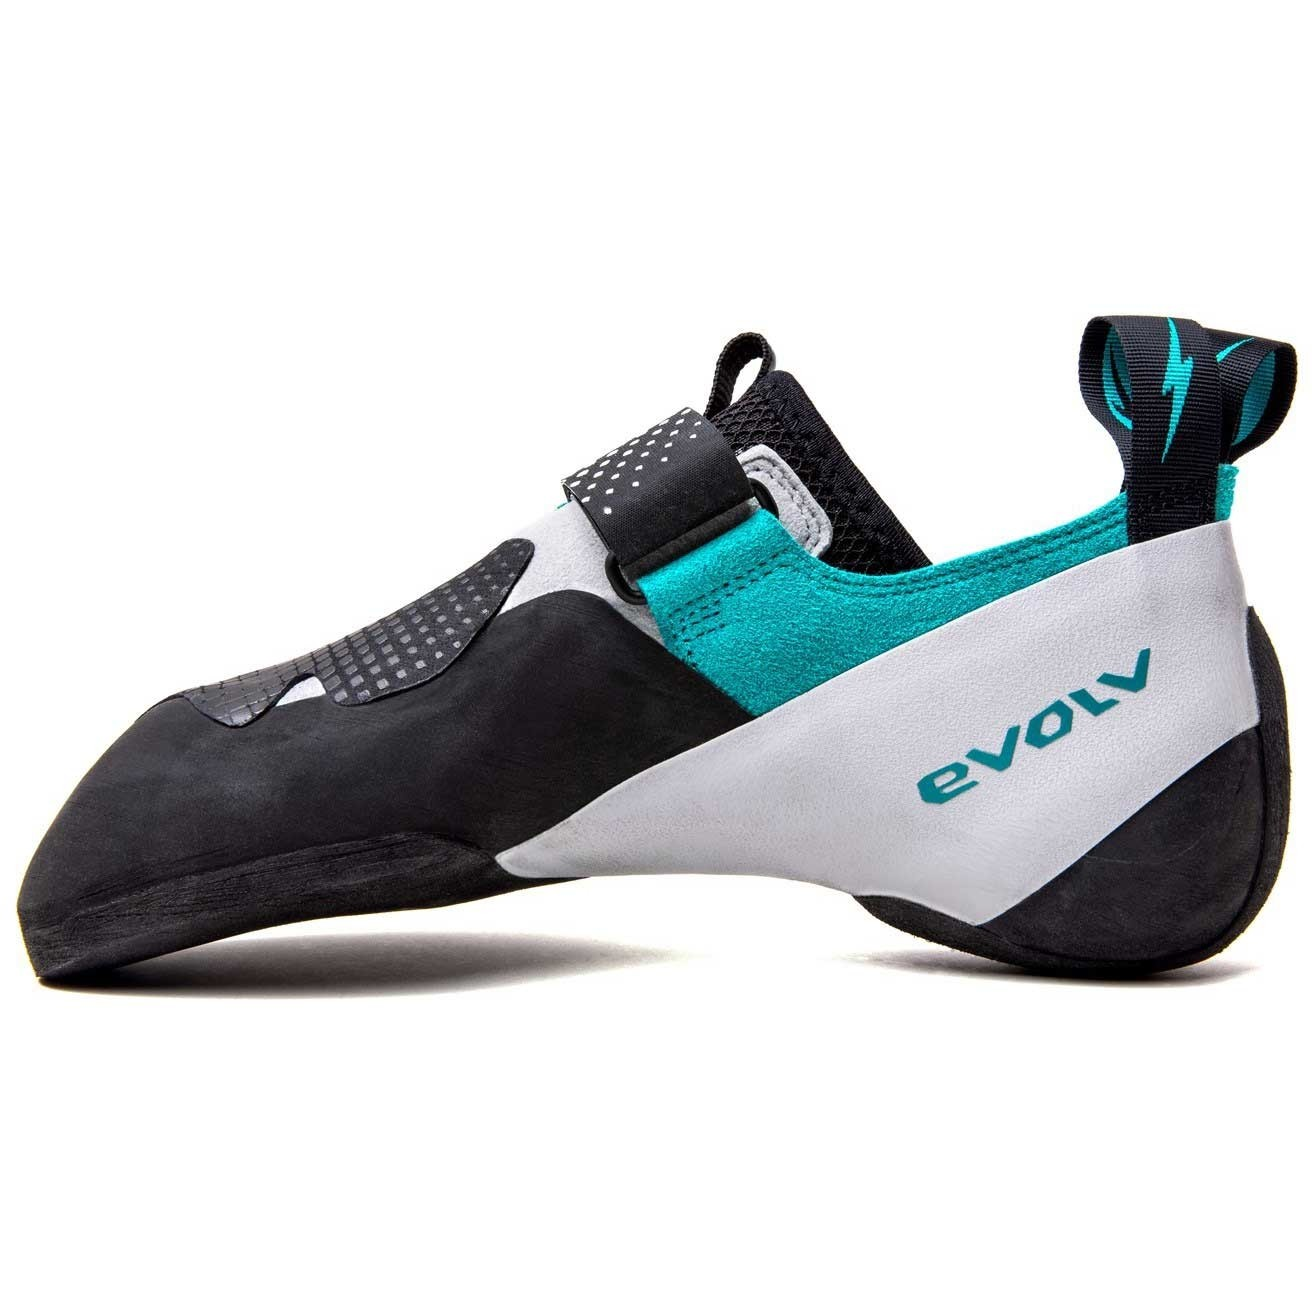 Evolv Zenist Climbing Shoe - Women's - Black/White/Turquoise